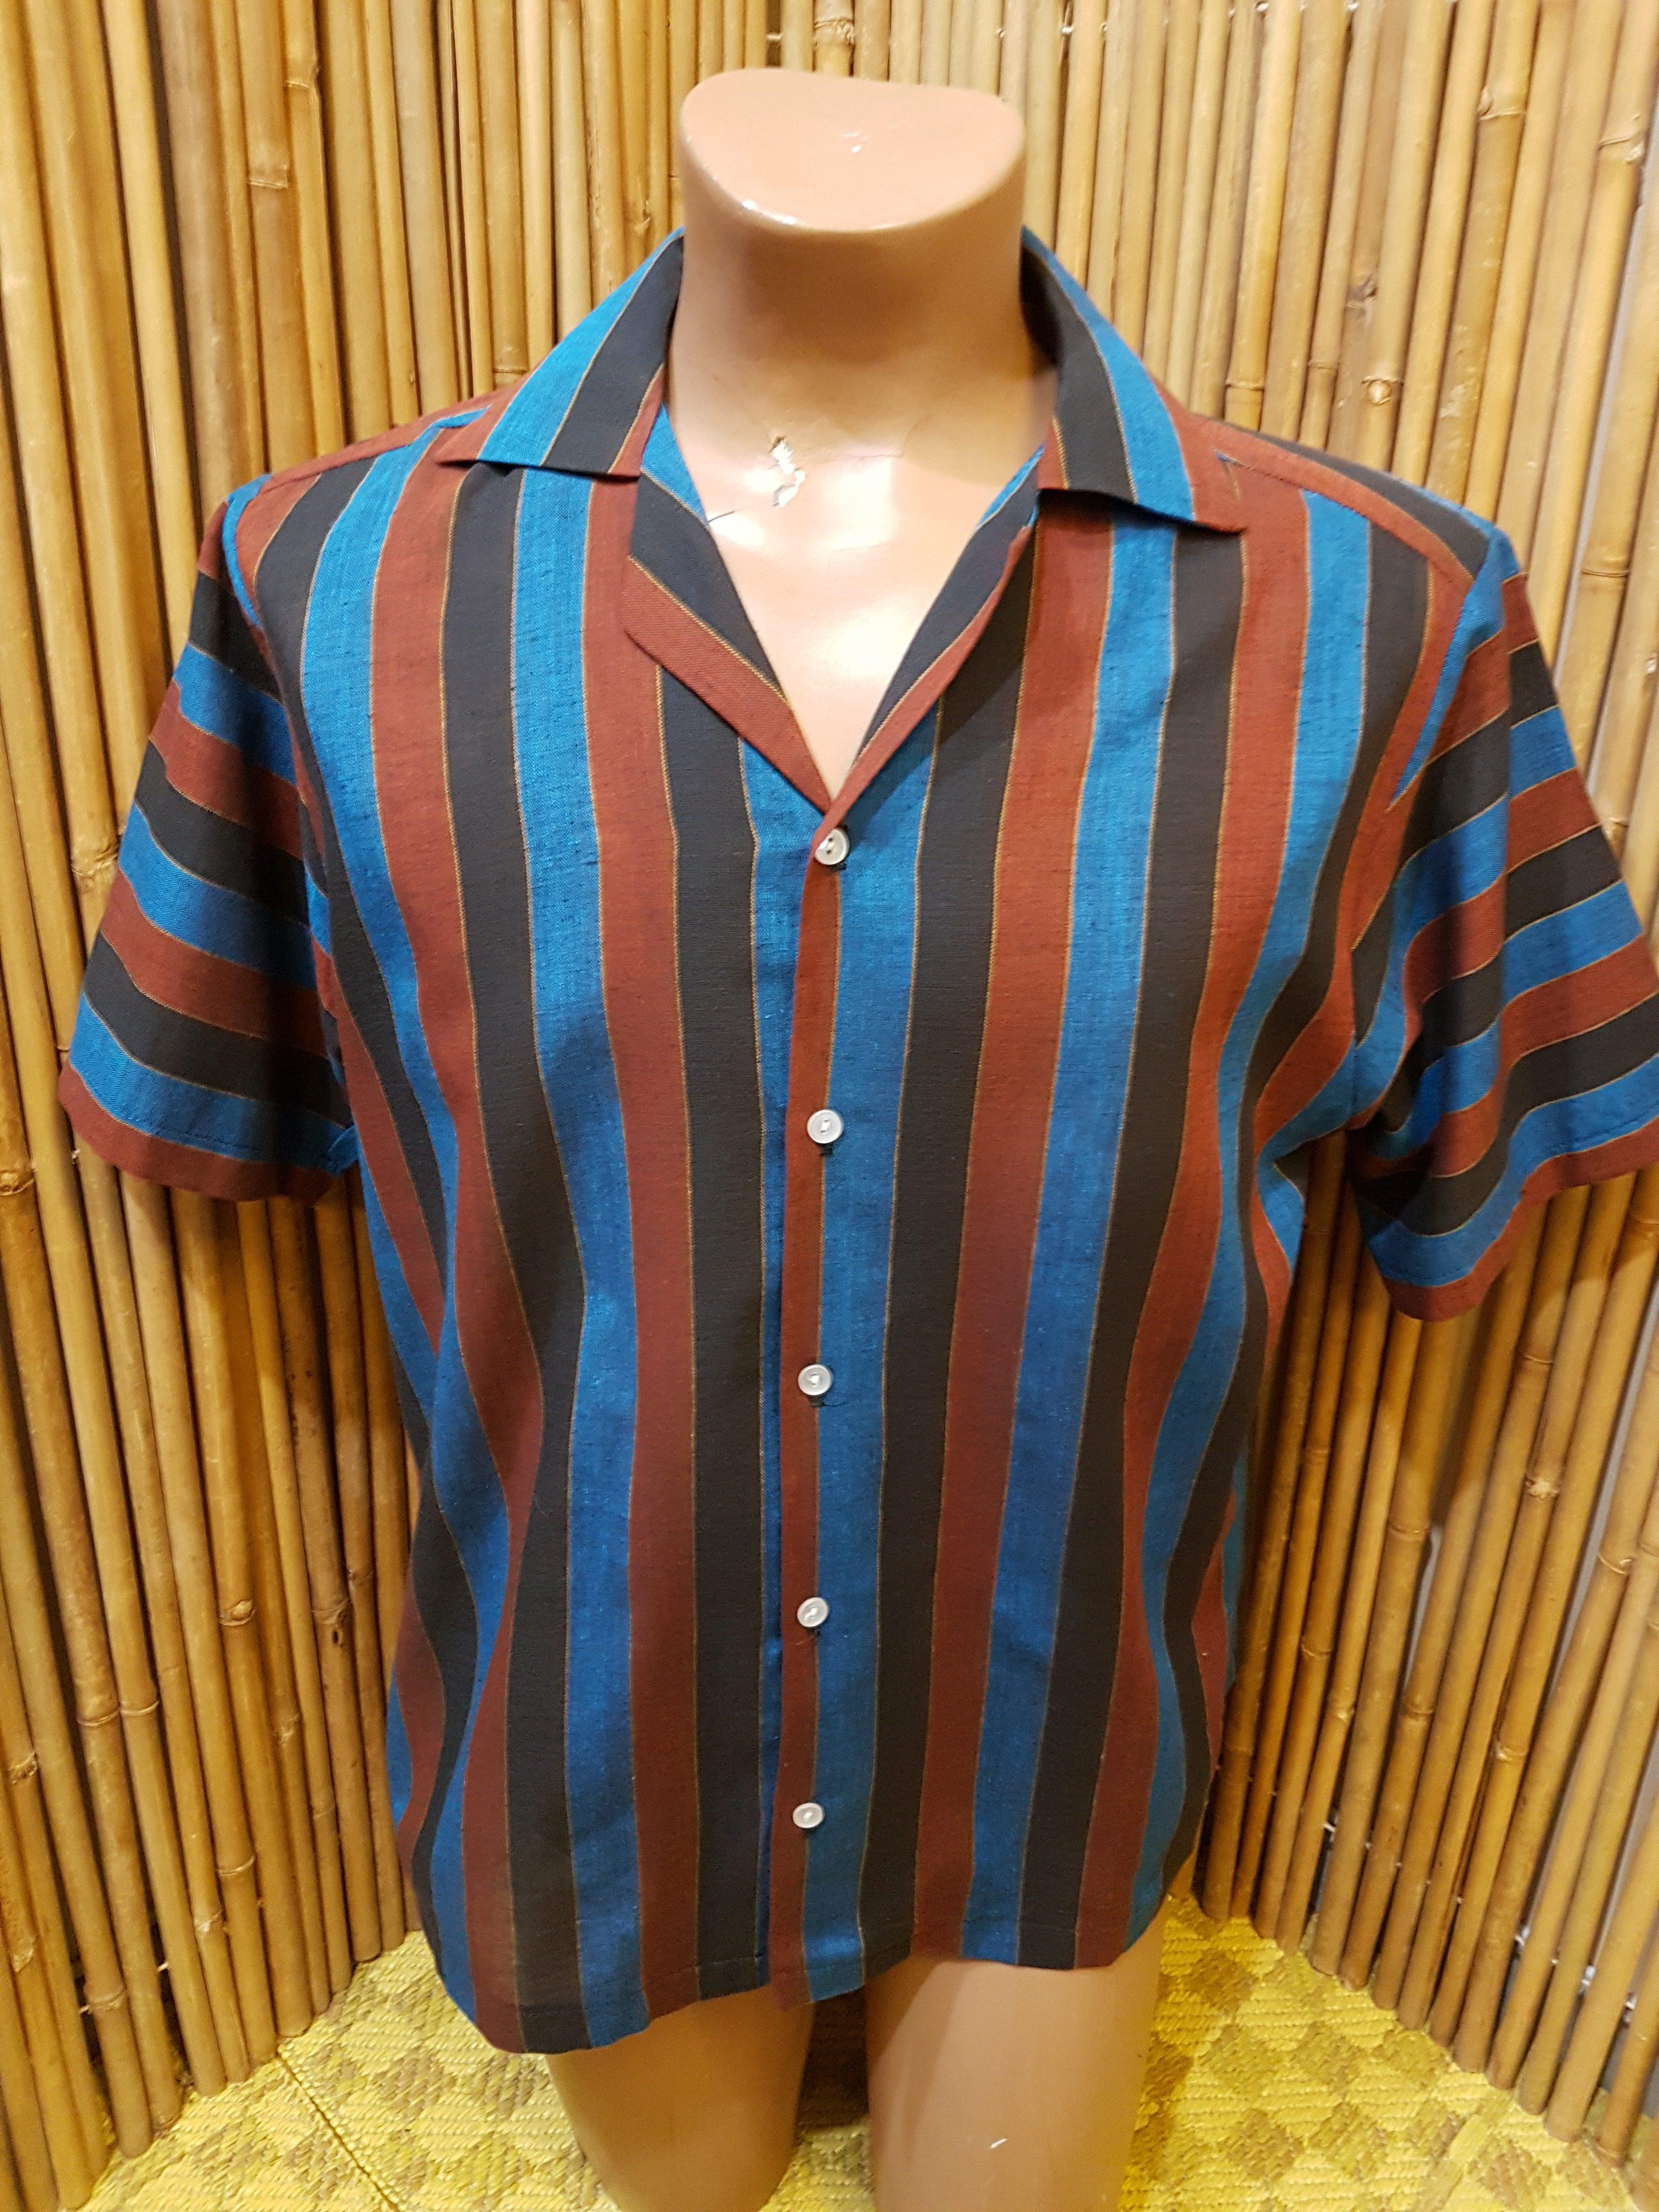 La Riviera Mens Repro 50s Style Shirt Tornado Vintage